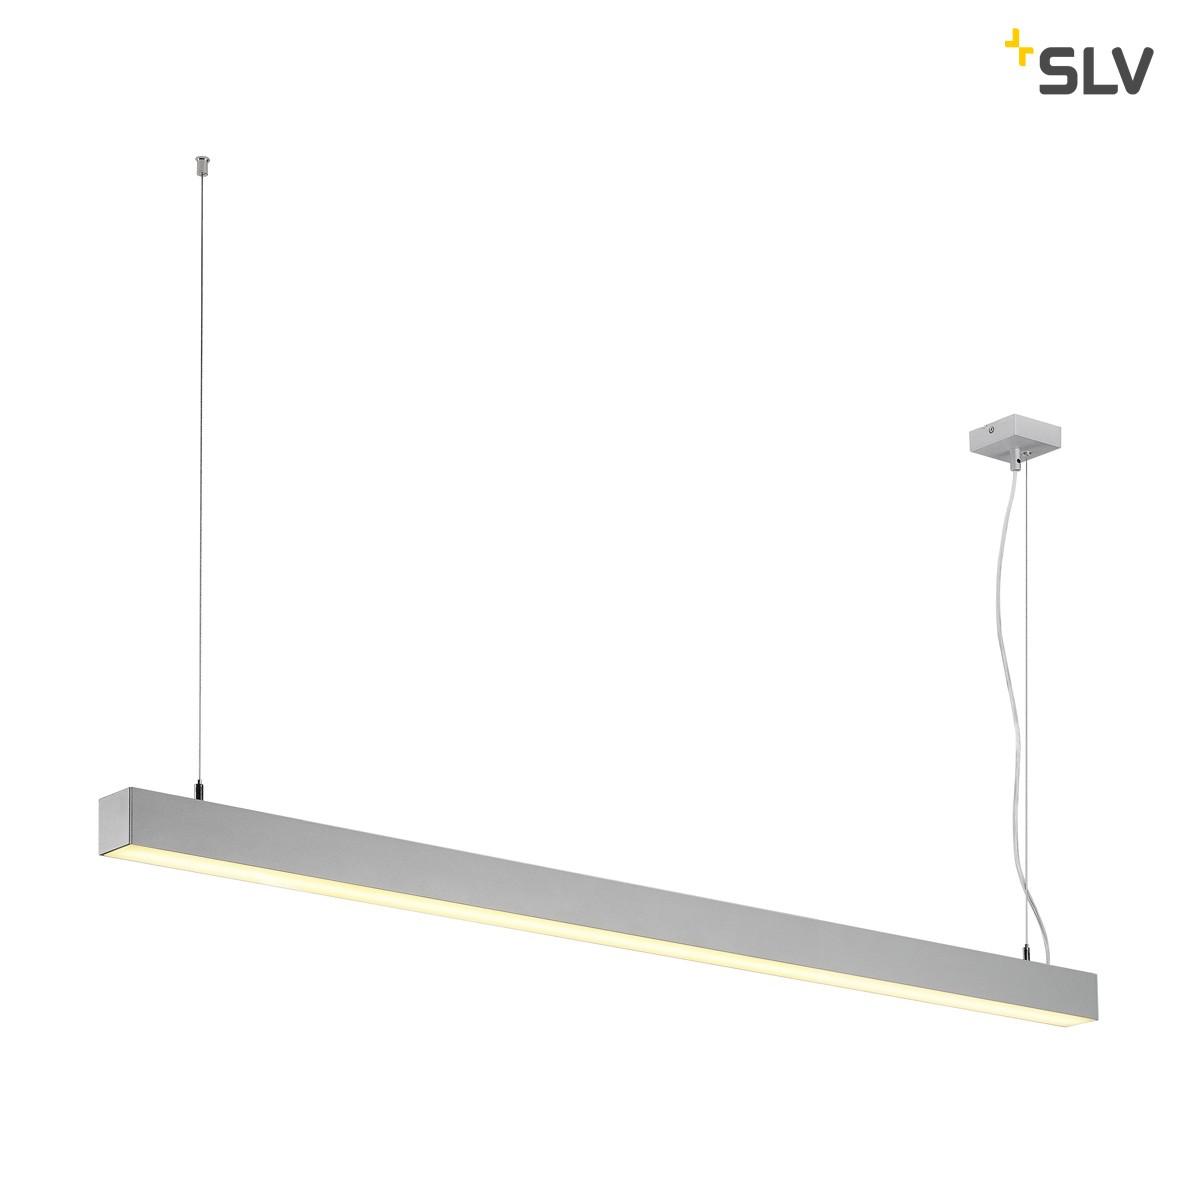 SLV Q-Line Single Pendelleuchte, silbergrau